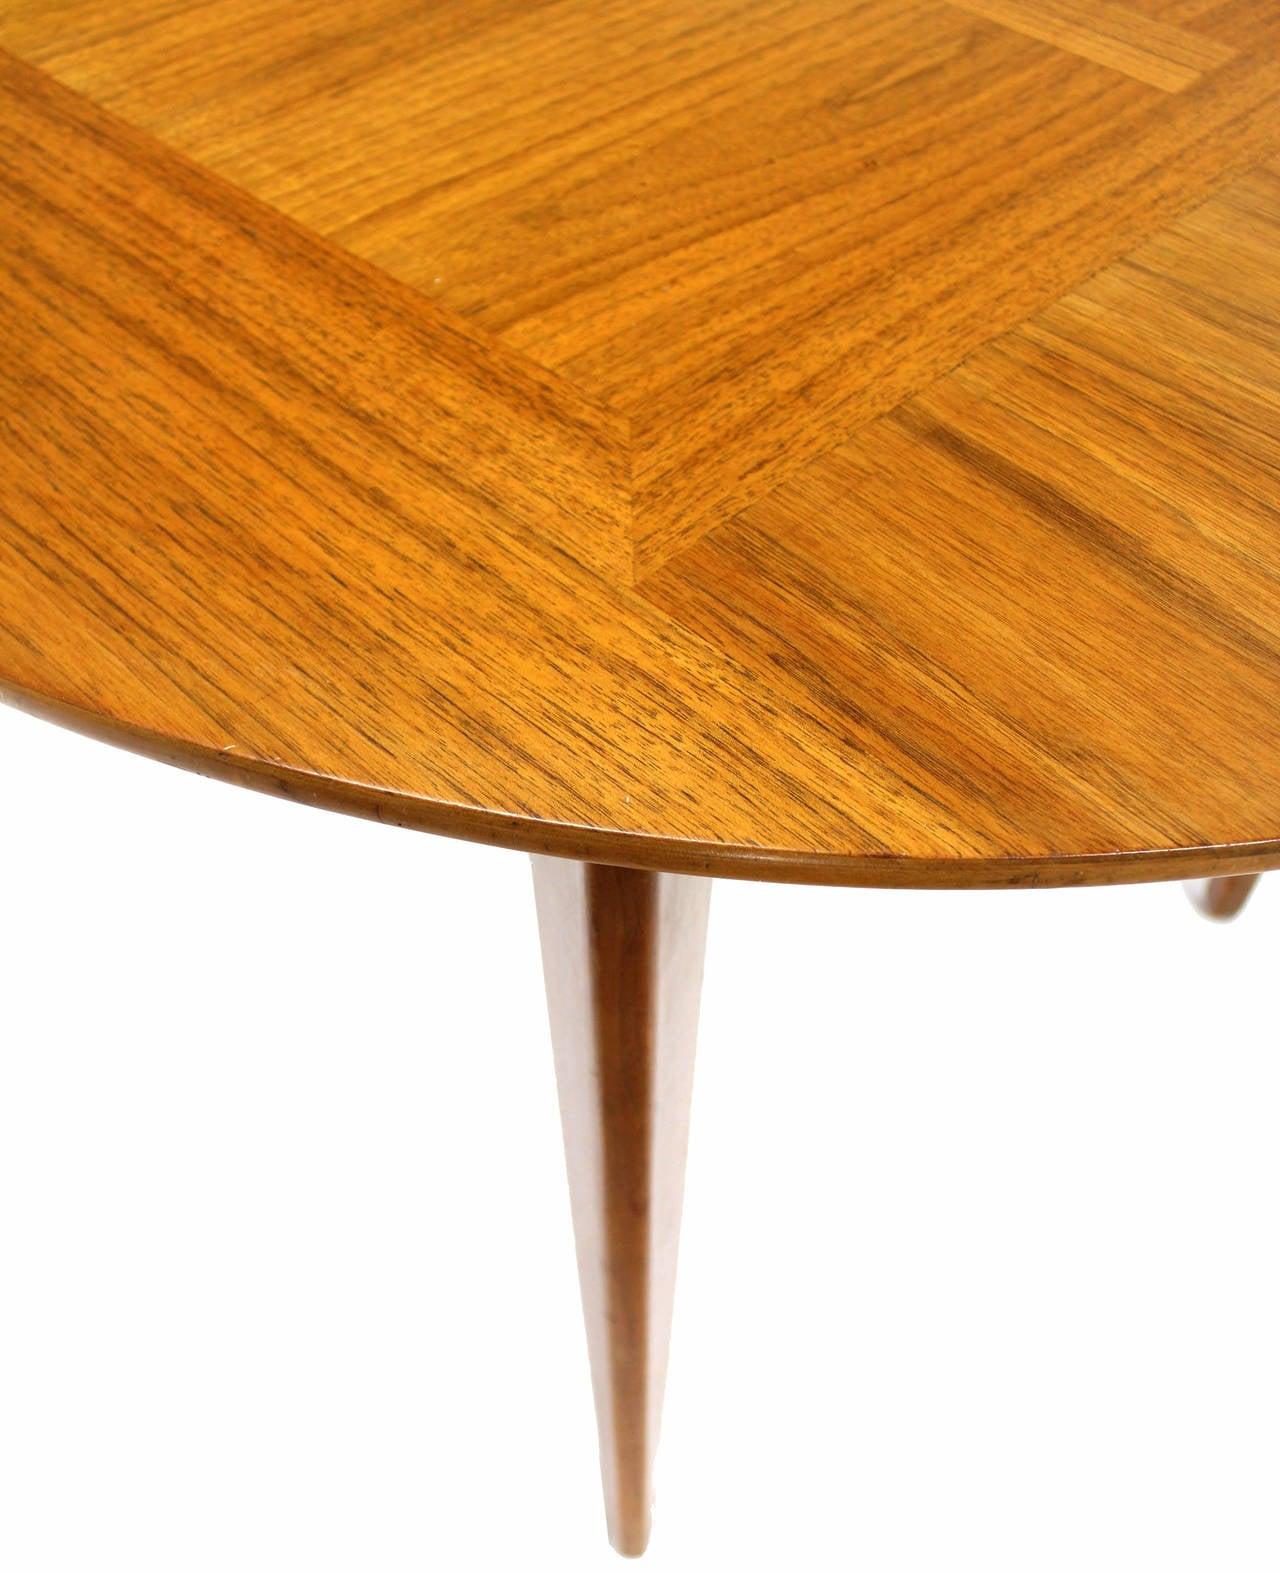 very nice walnut wood grain mid century modern dining table with 3 12